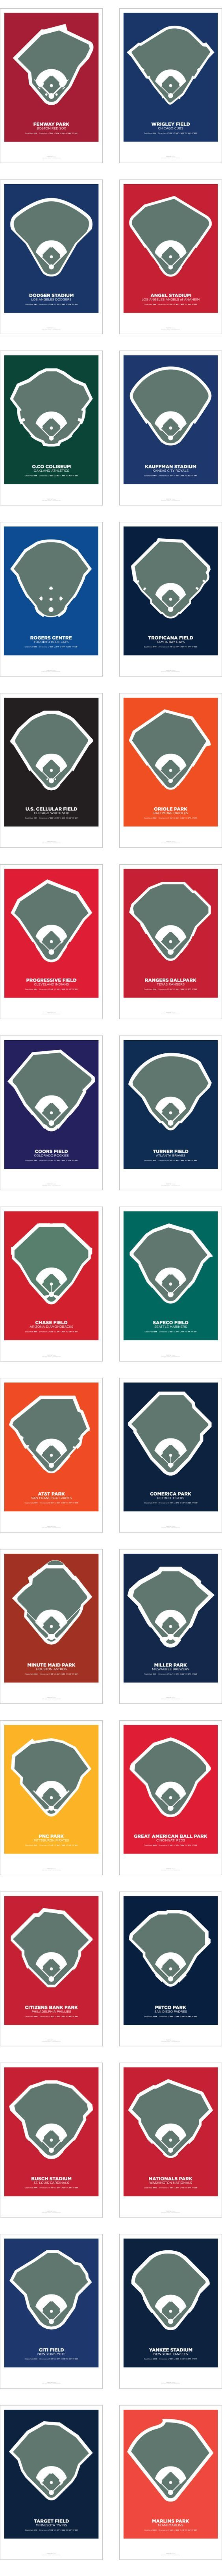 THIRTY81: The Fields of Baseball Poster Series, ReKicked by Lou Spirito — Kickstarter: